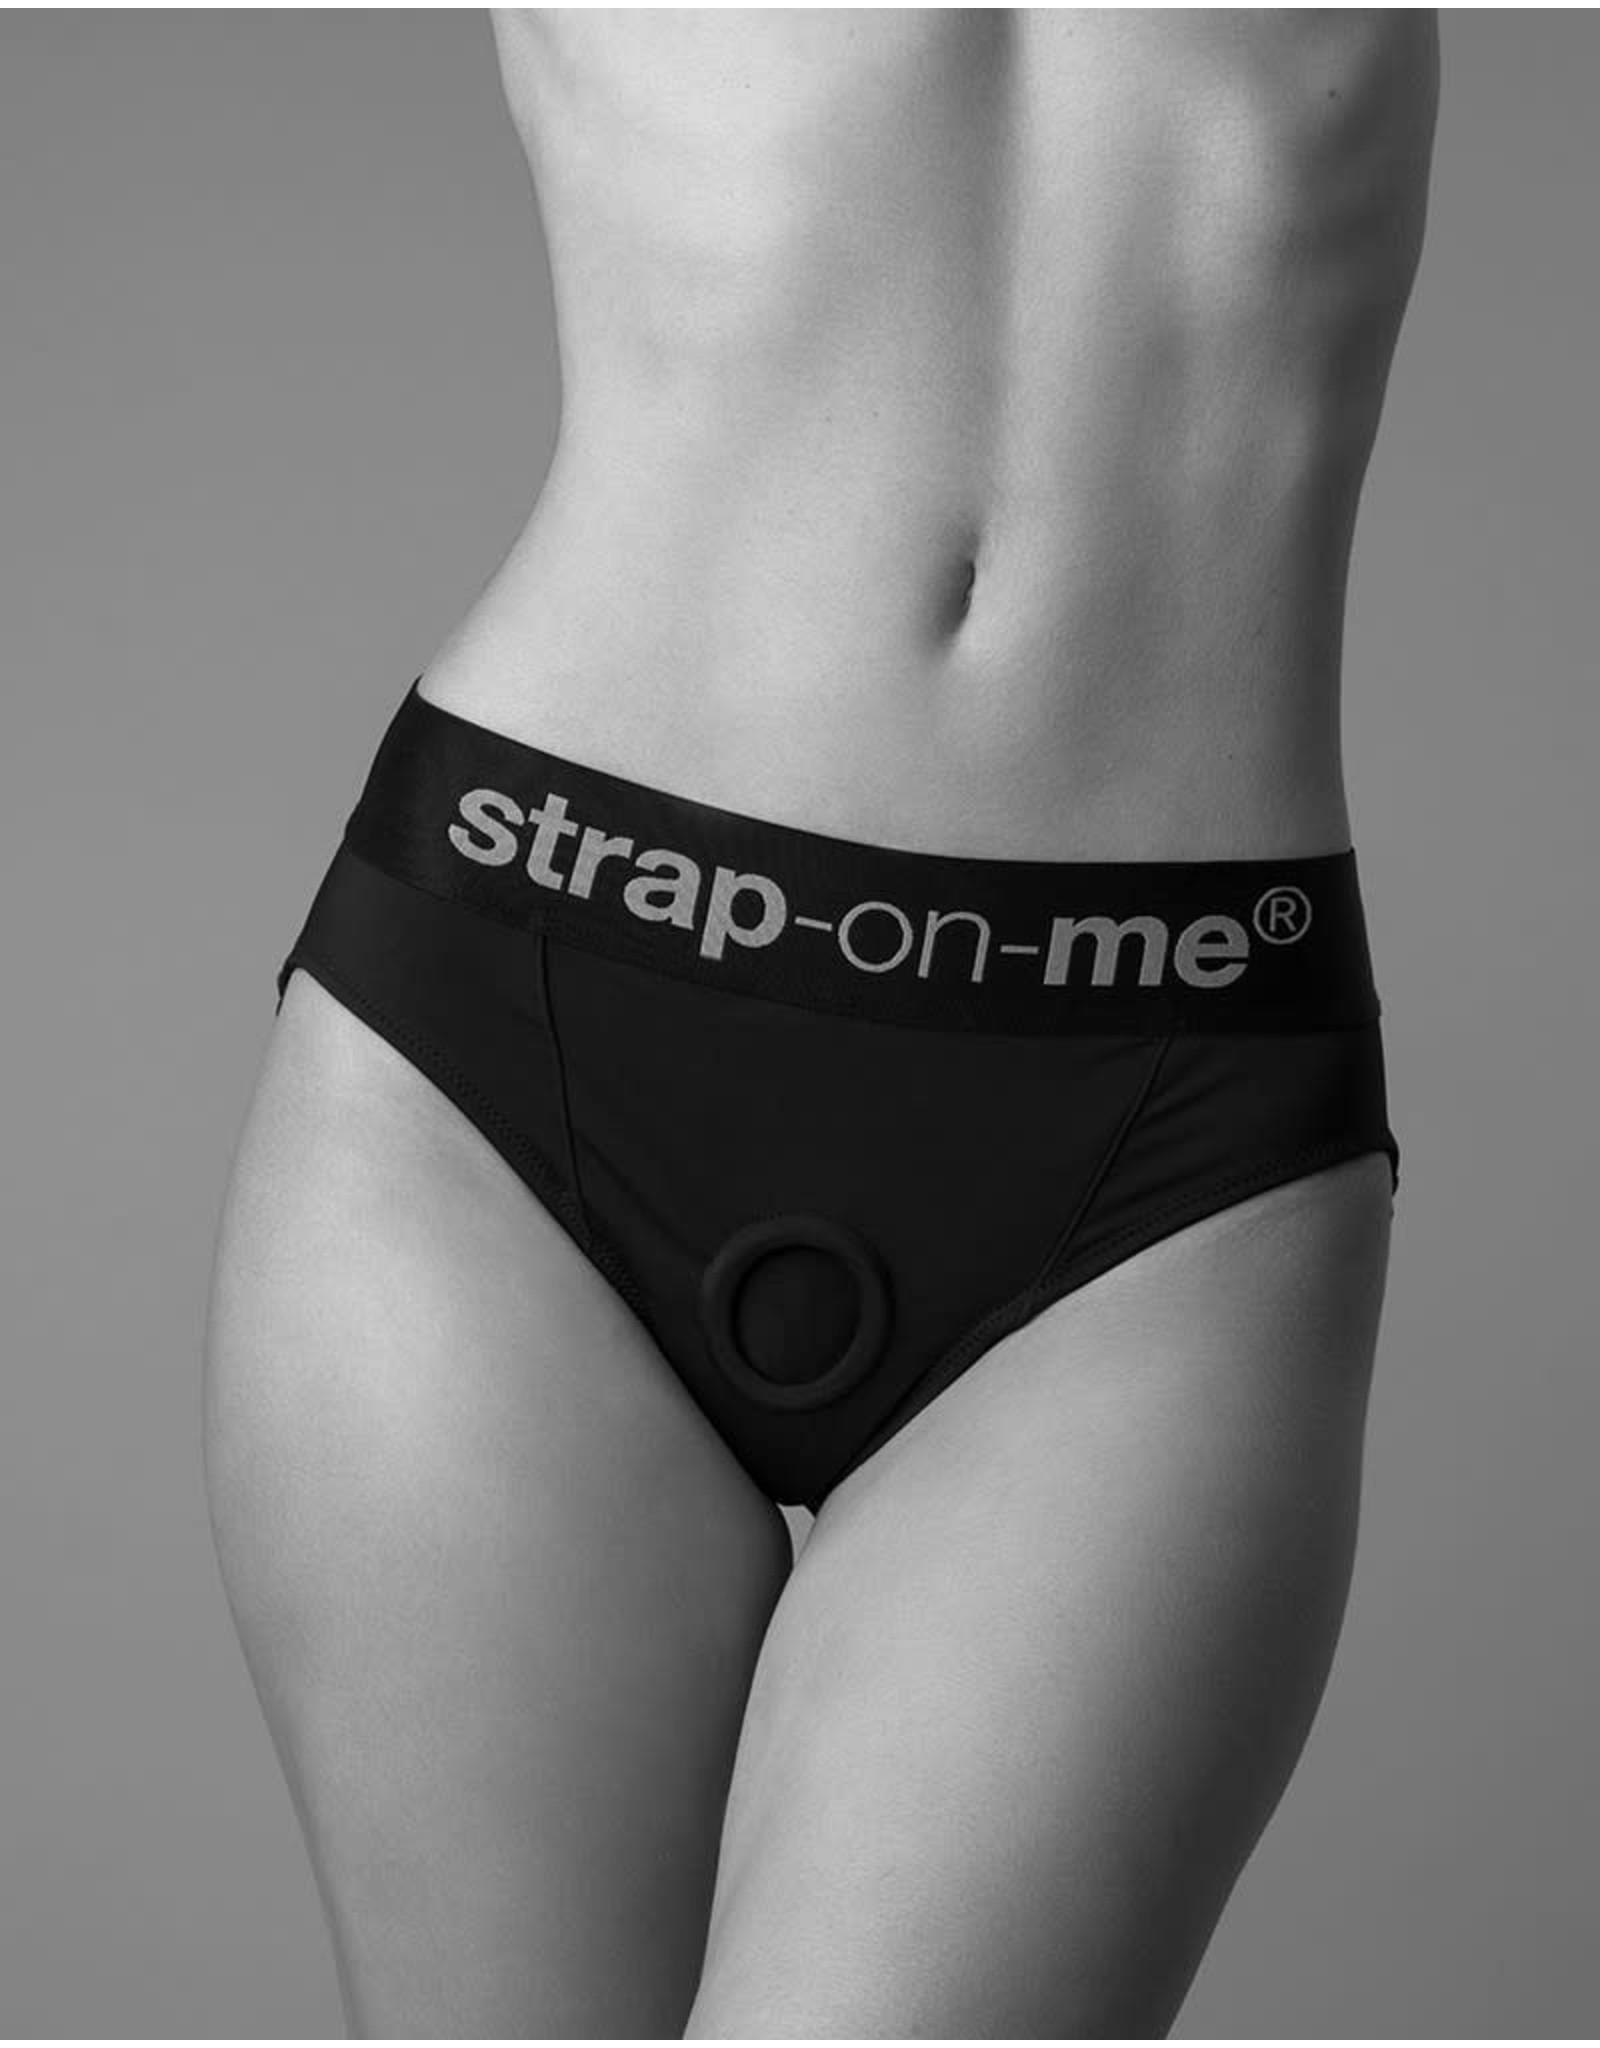 STRAP-ON-ME STRAPONME HARNESS LINGERIE HEROINE - M